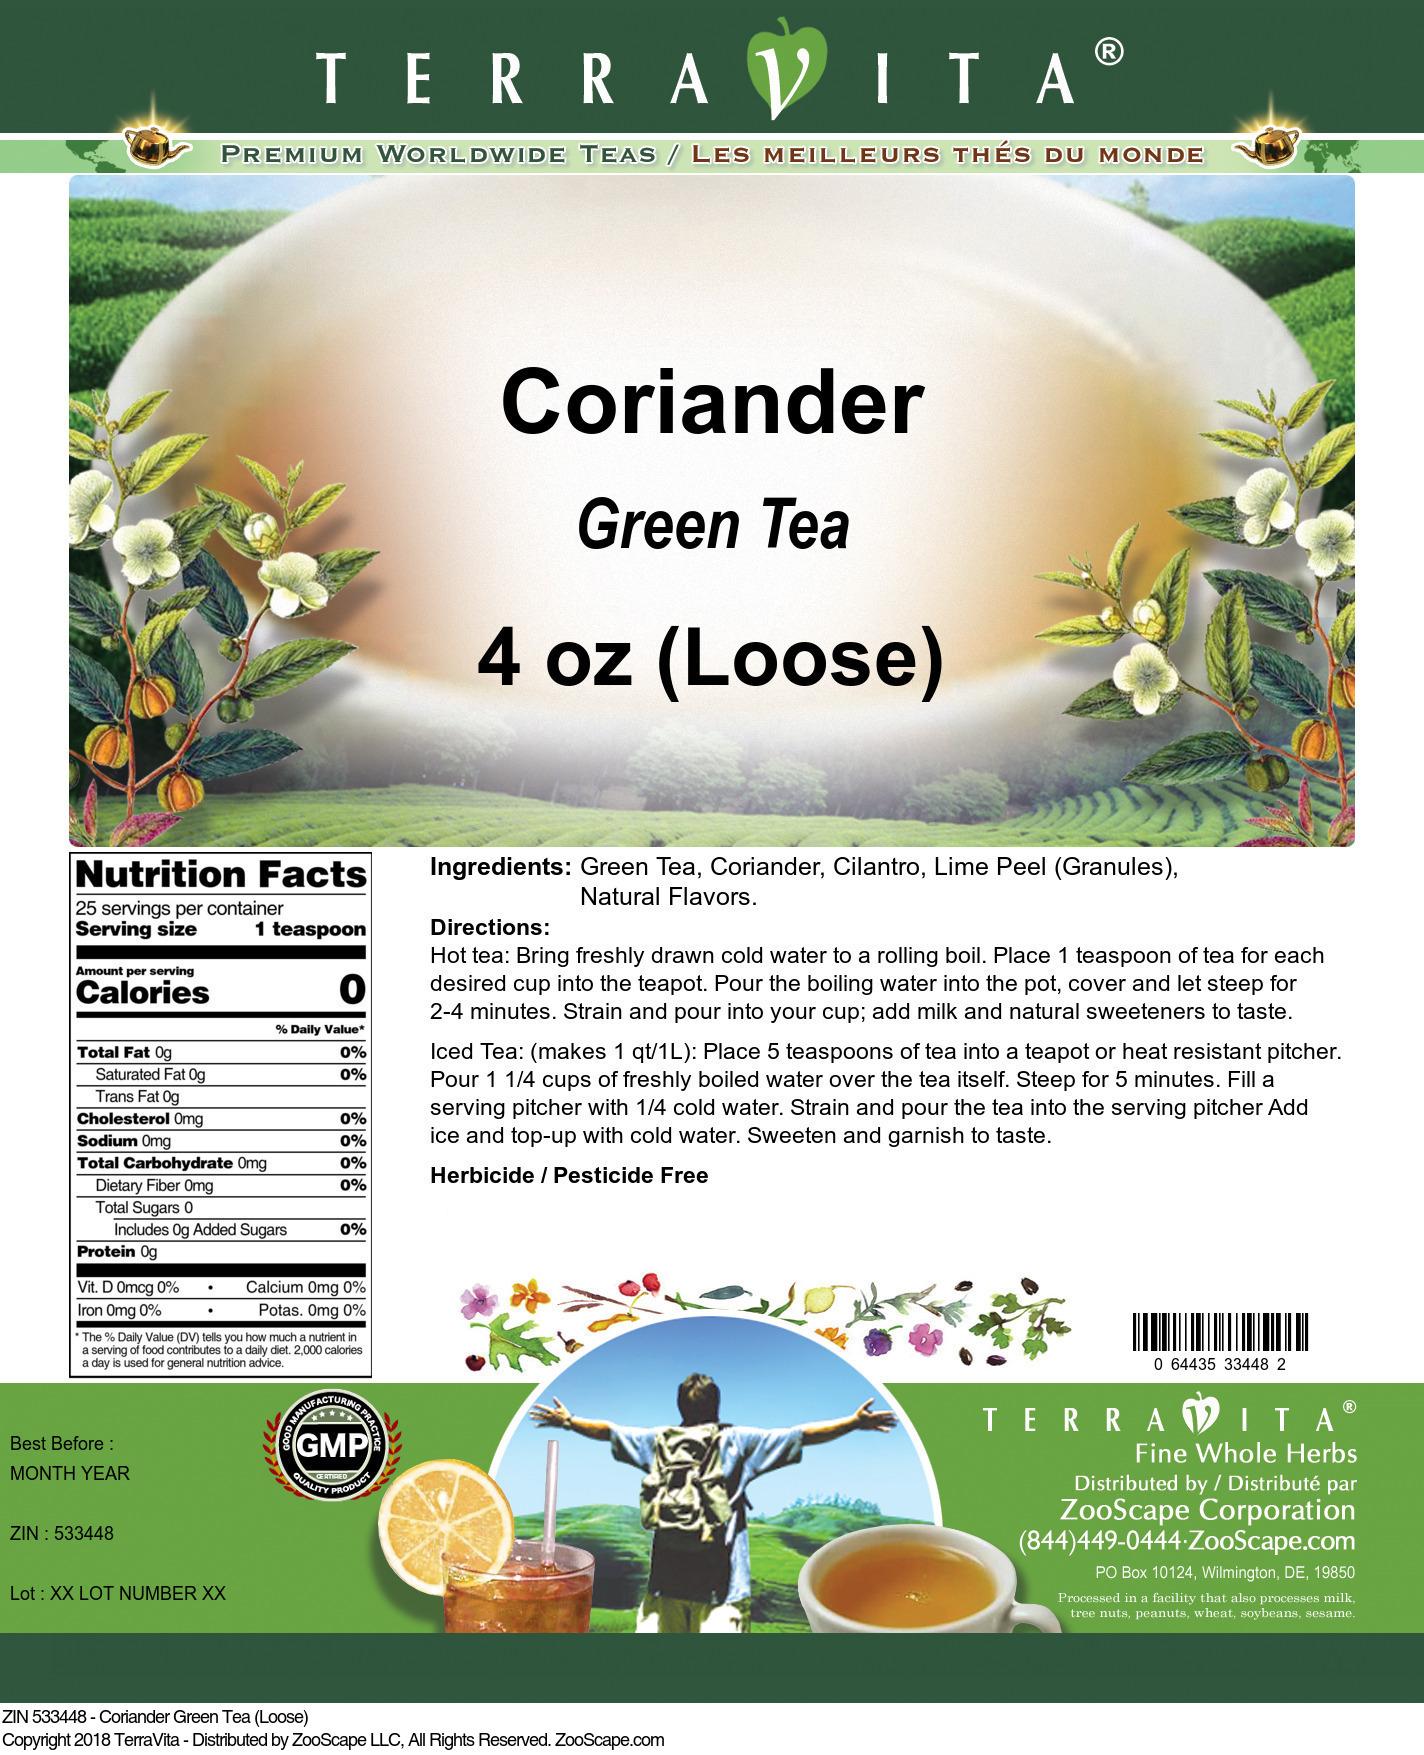 Coriander Green Tea (Loose)